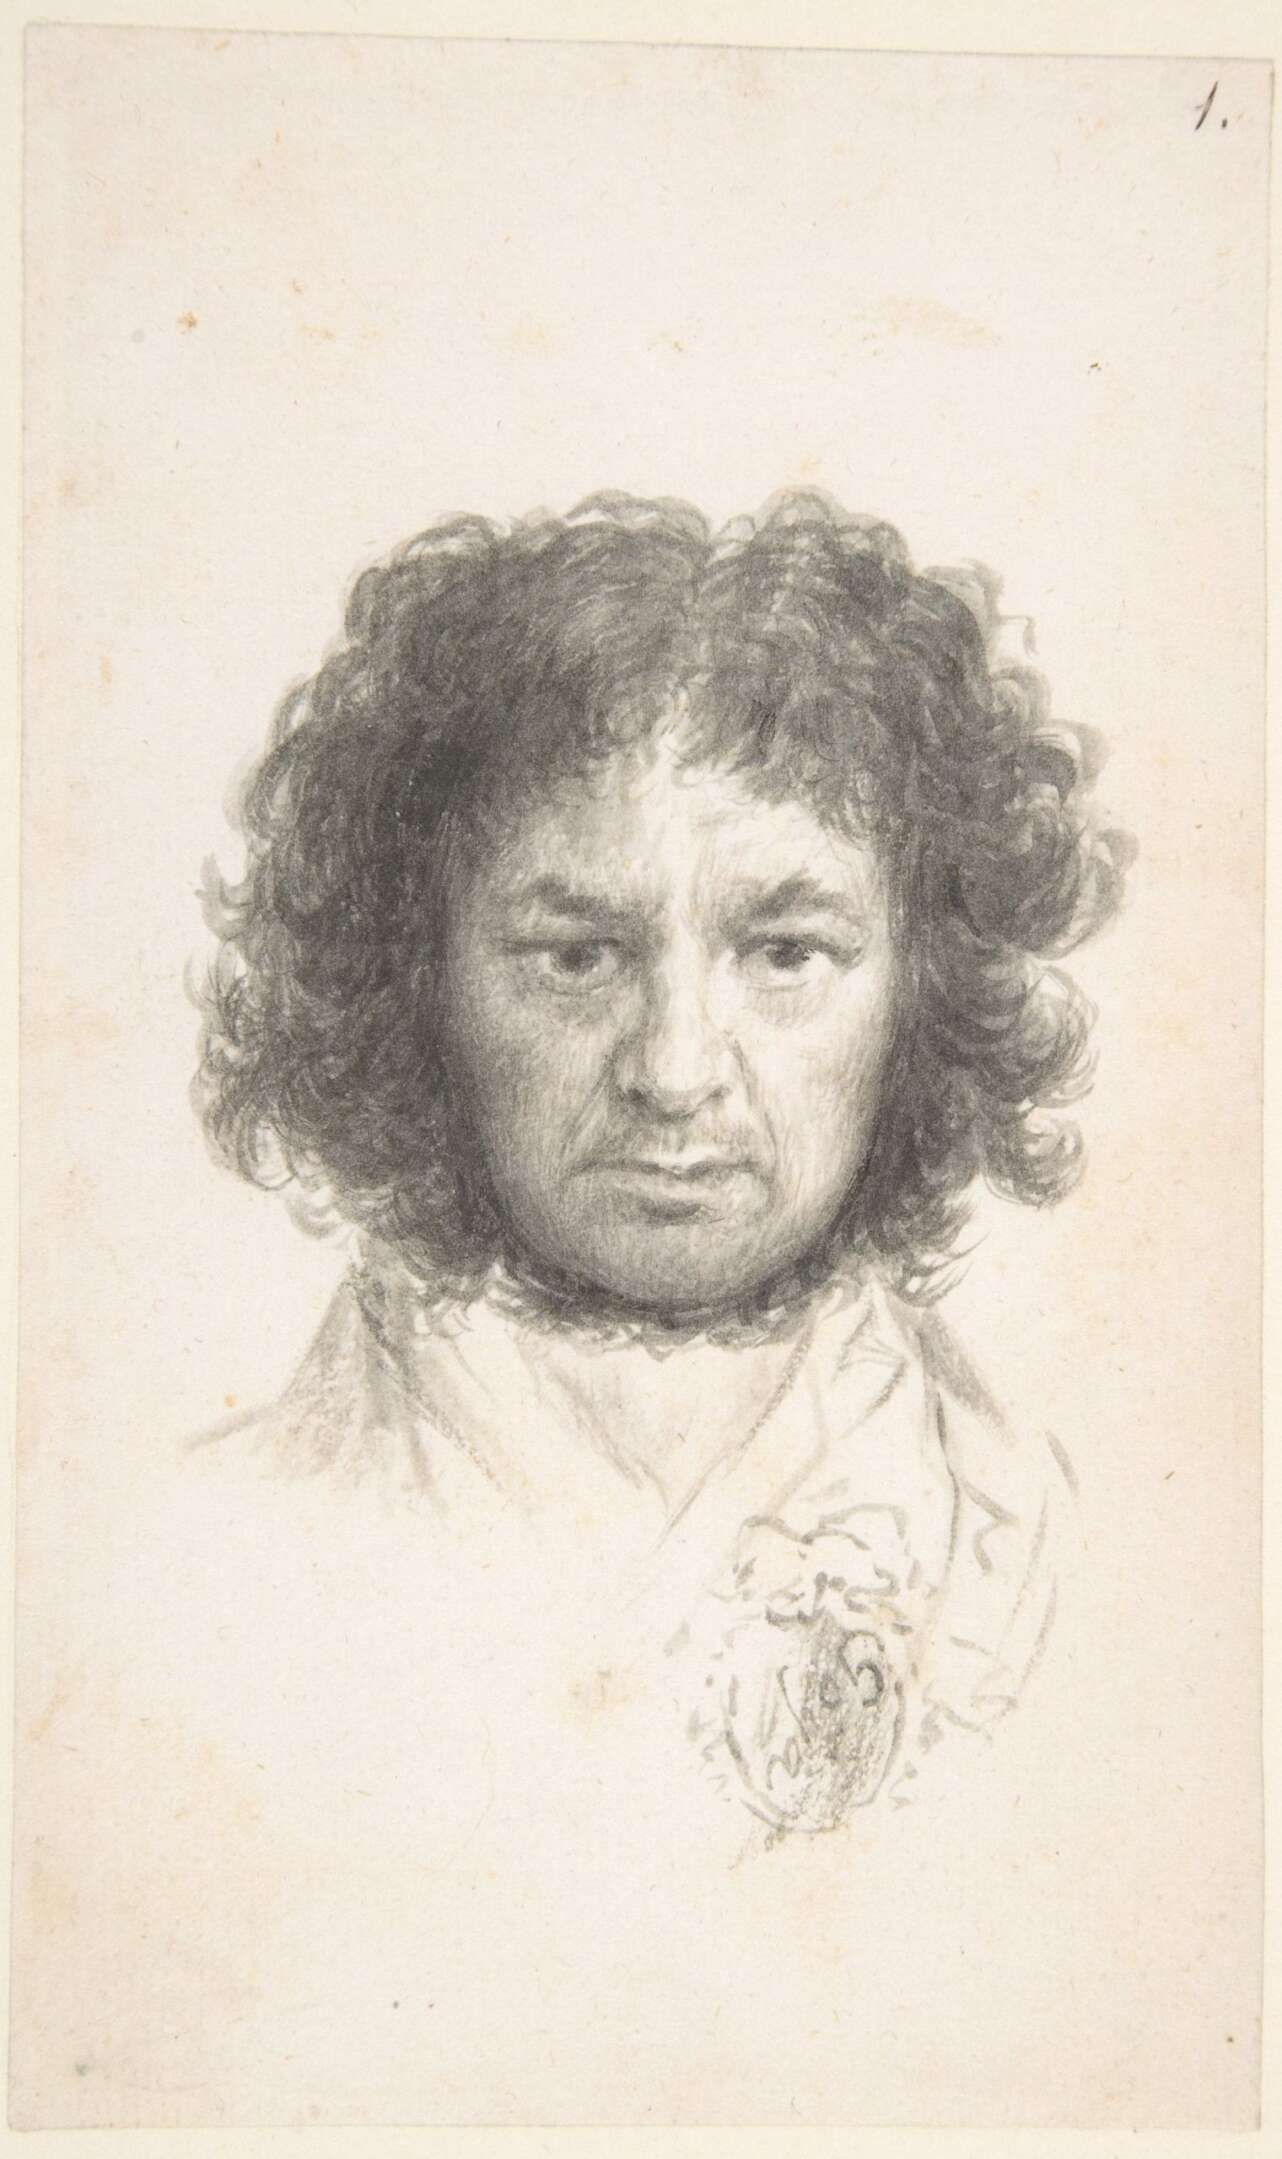 Autorretrato, Goya. Nueva York, The Metropolitan Museum of Art, Harris Brisbane Dick Fund, 1935